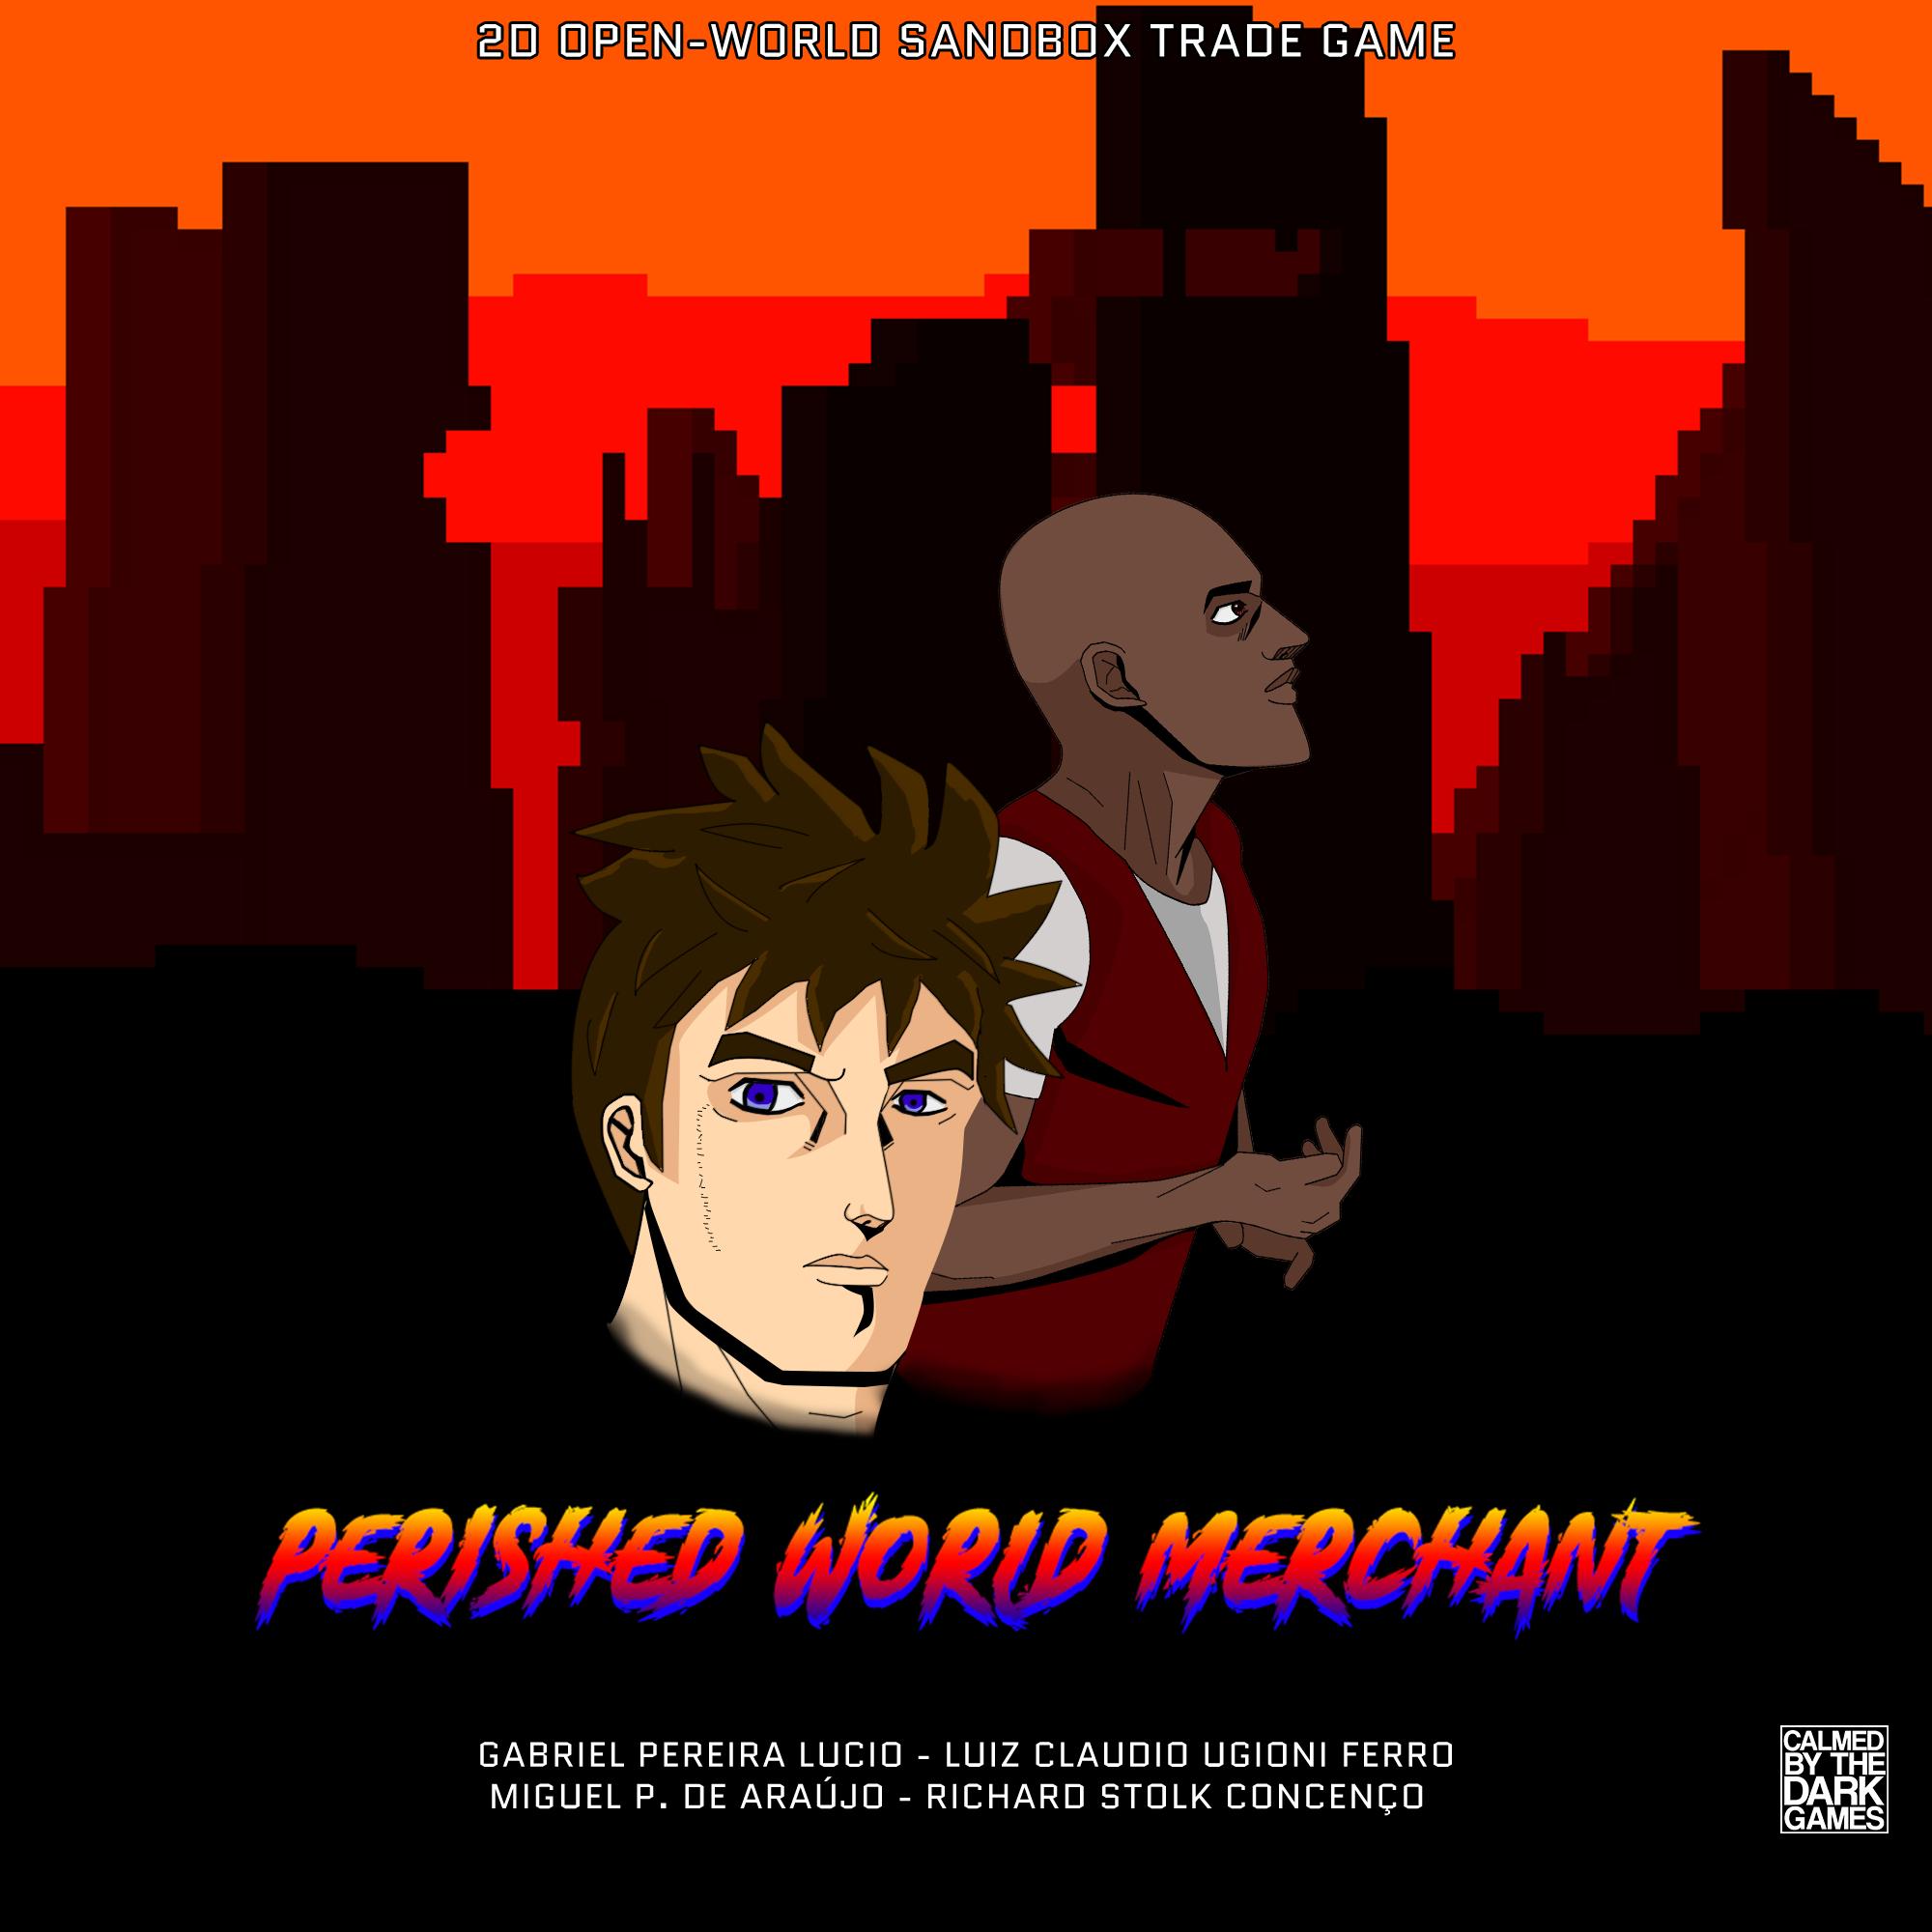 """Perished World Merchant"" + ""Calmed by the Dark: NEON"" (PC) gratis auf itch.io"